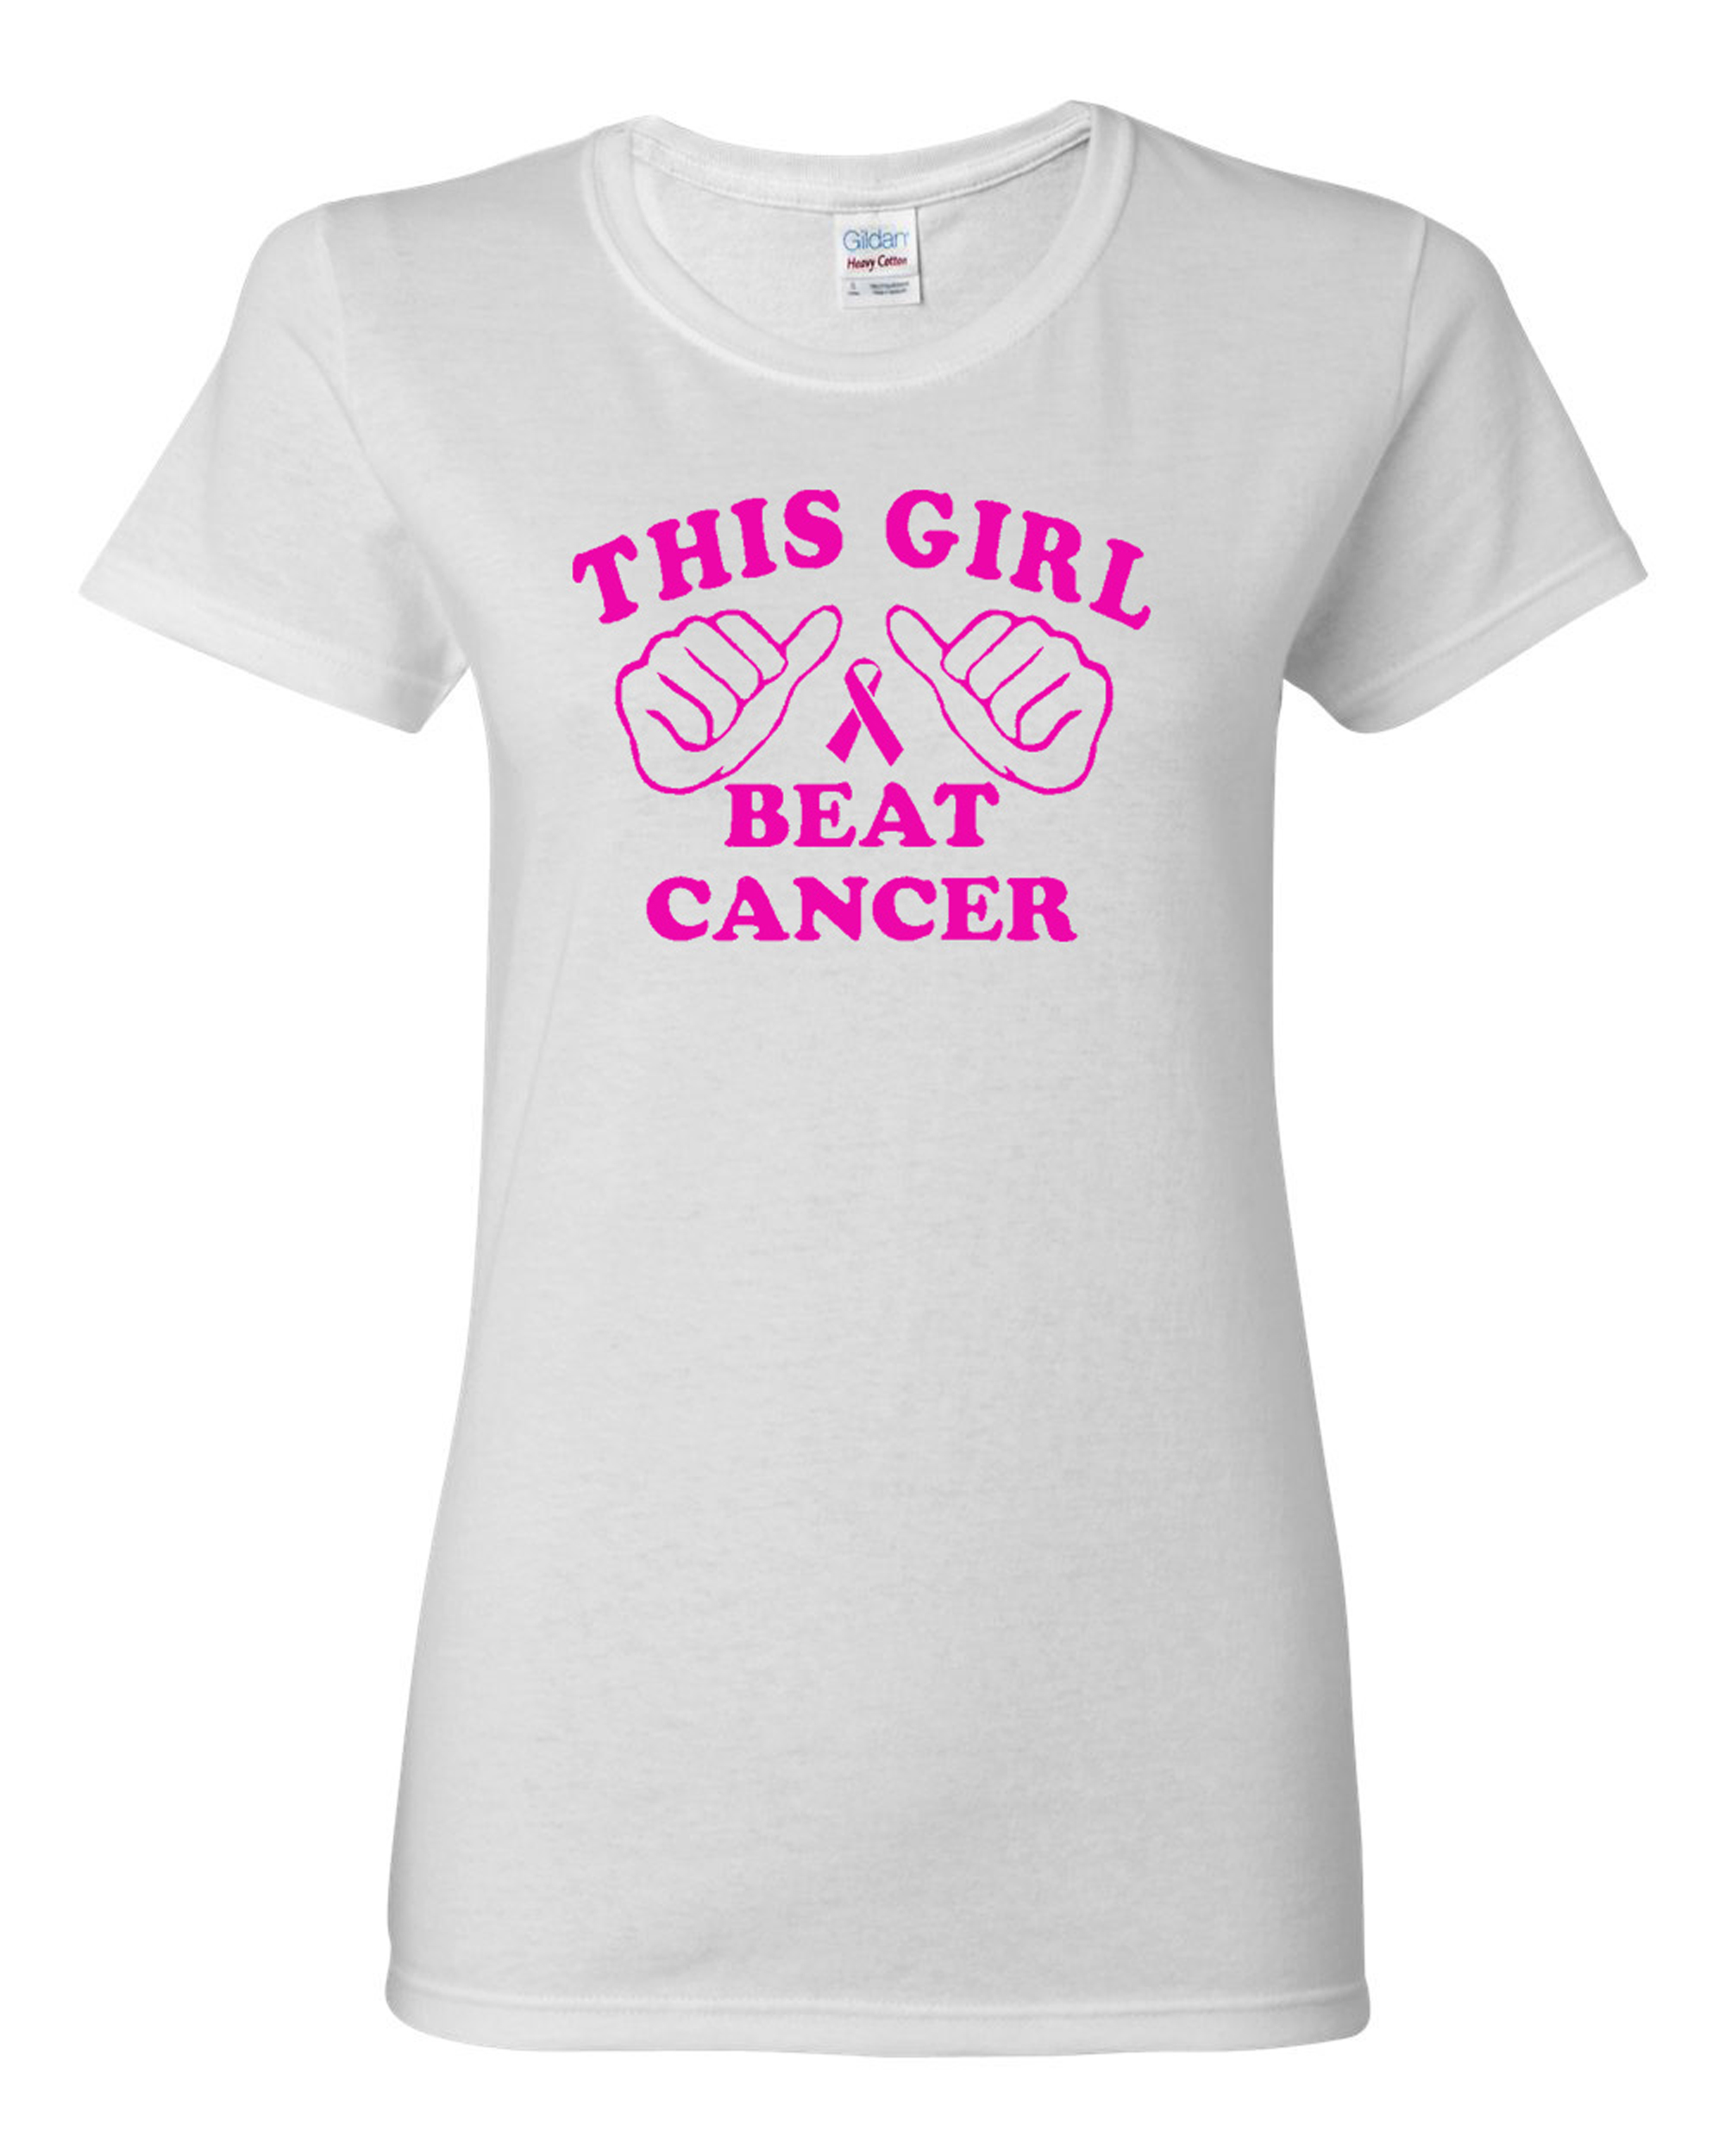 Ladies This Girl Beat Cancer Survivor T-Shirt Tee